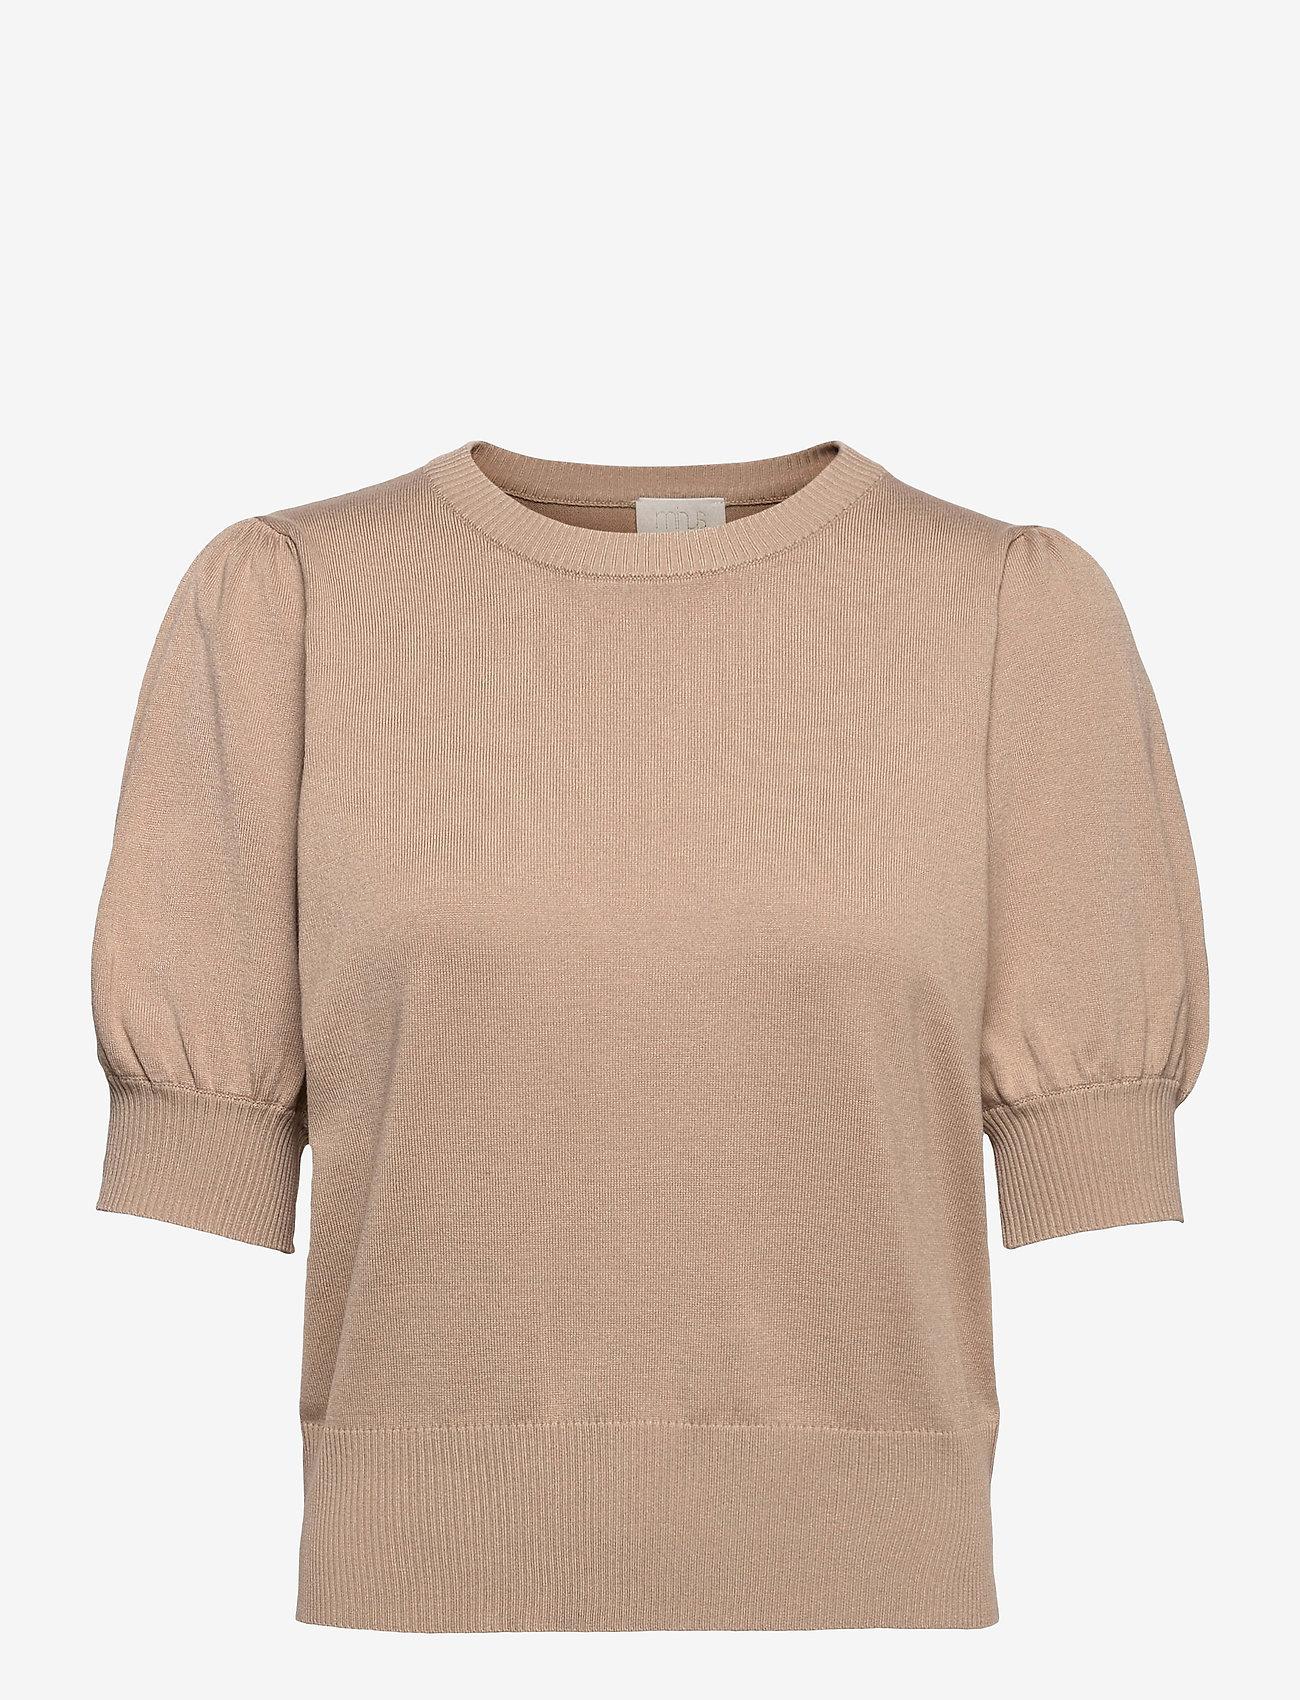 Minus - Liva knit tee - strikkede toppe - nomad sand - 0